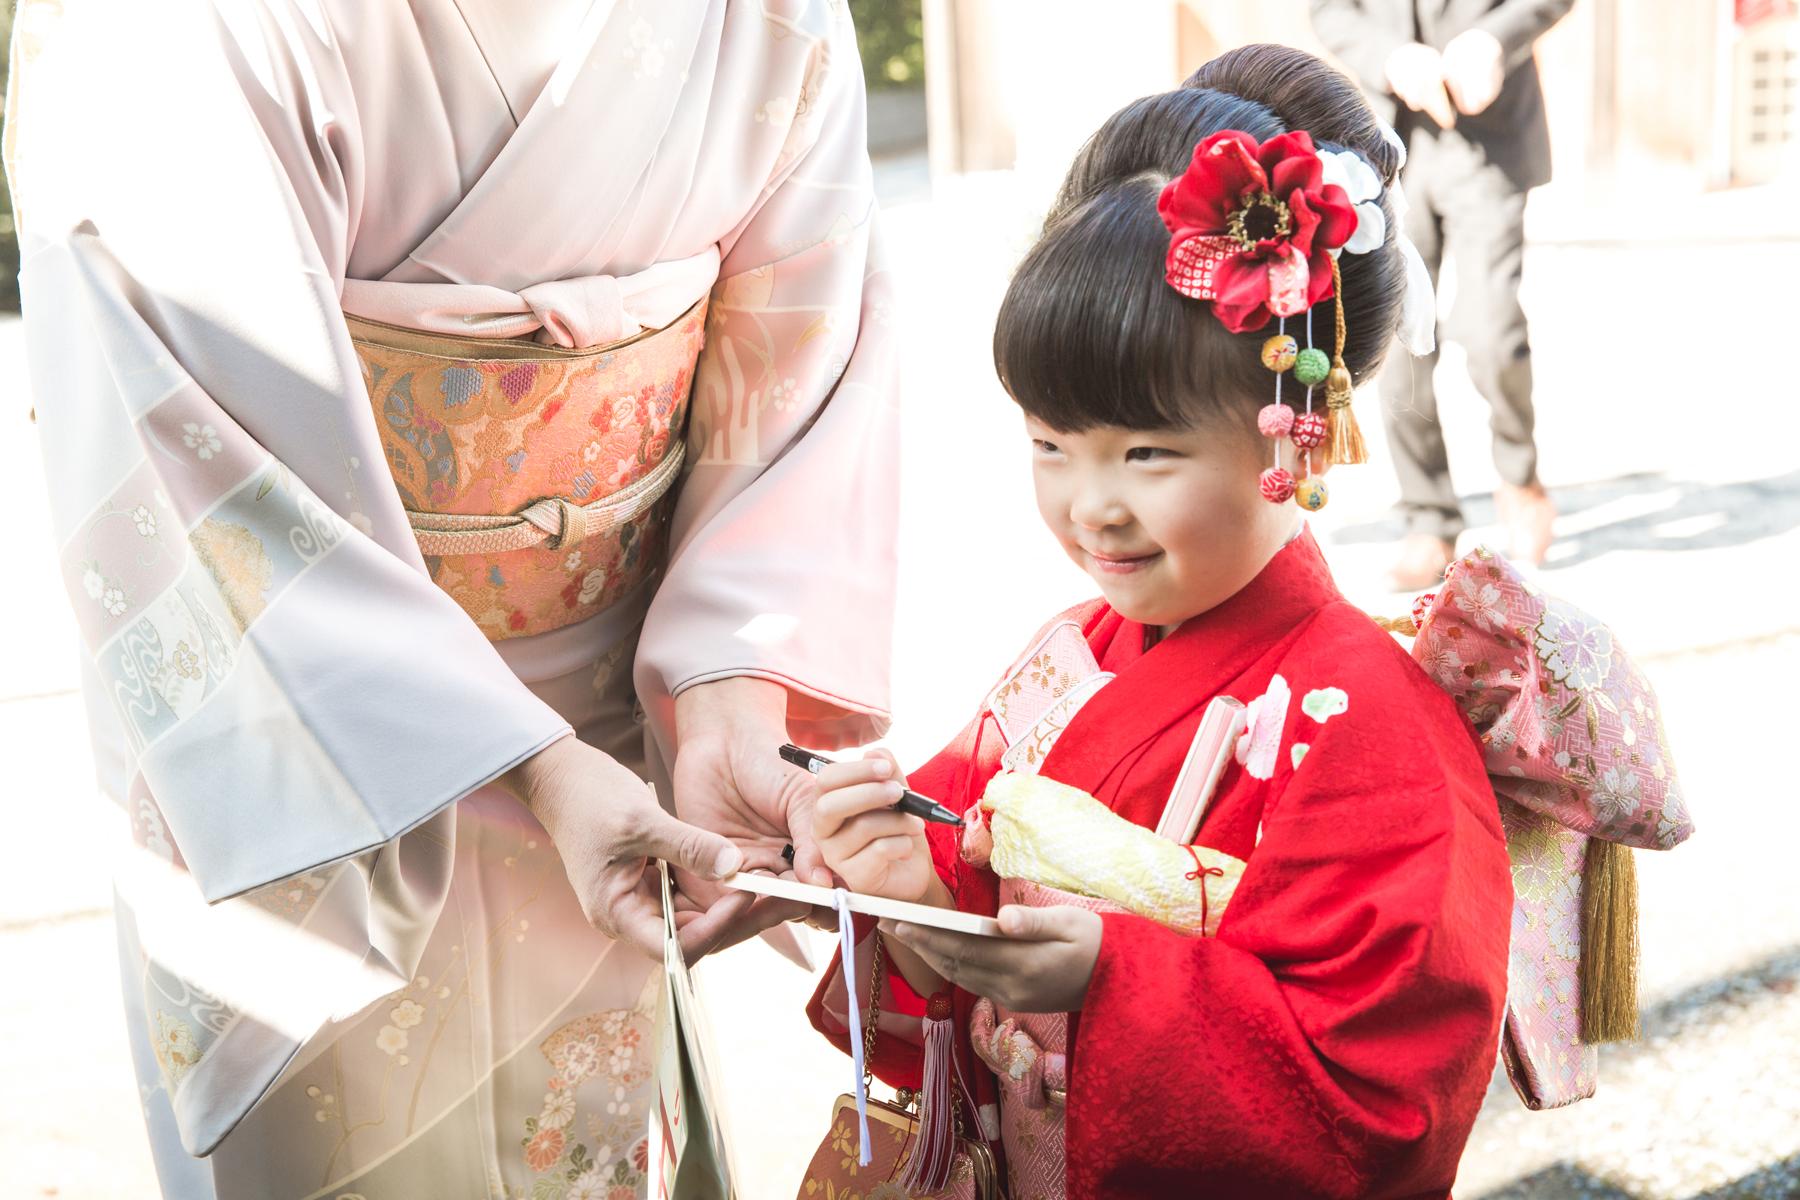 滋賀県彦根市の稲村神社で七五三撮影